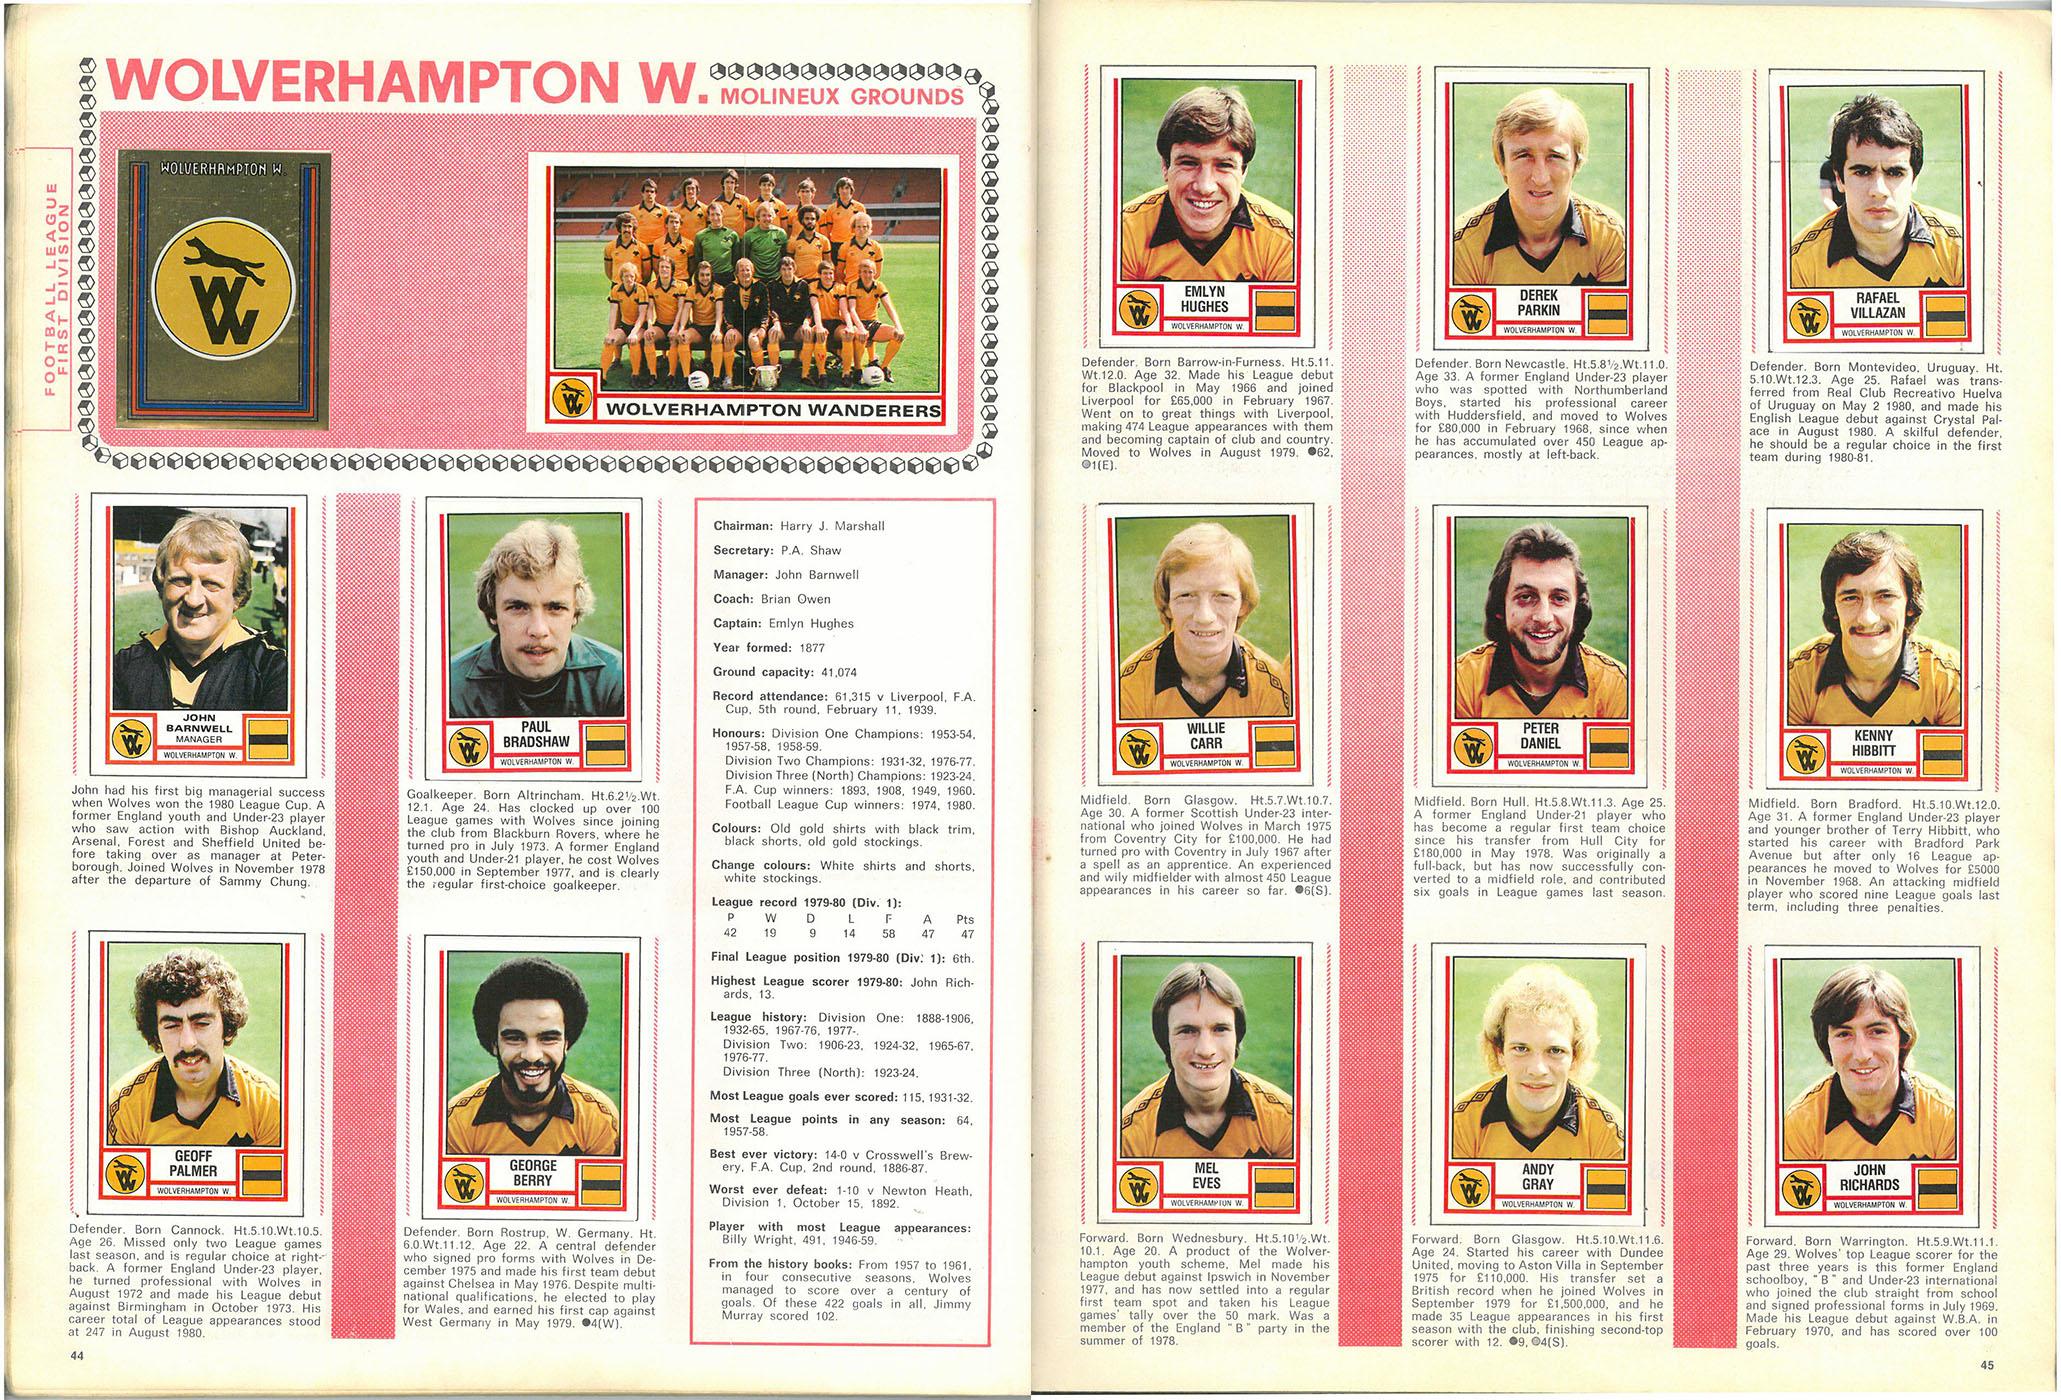 Wolverhampton Wanderers 1981